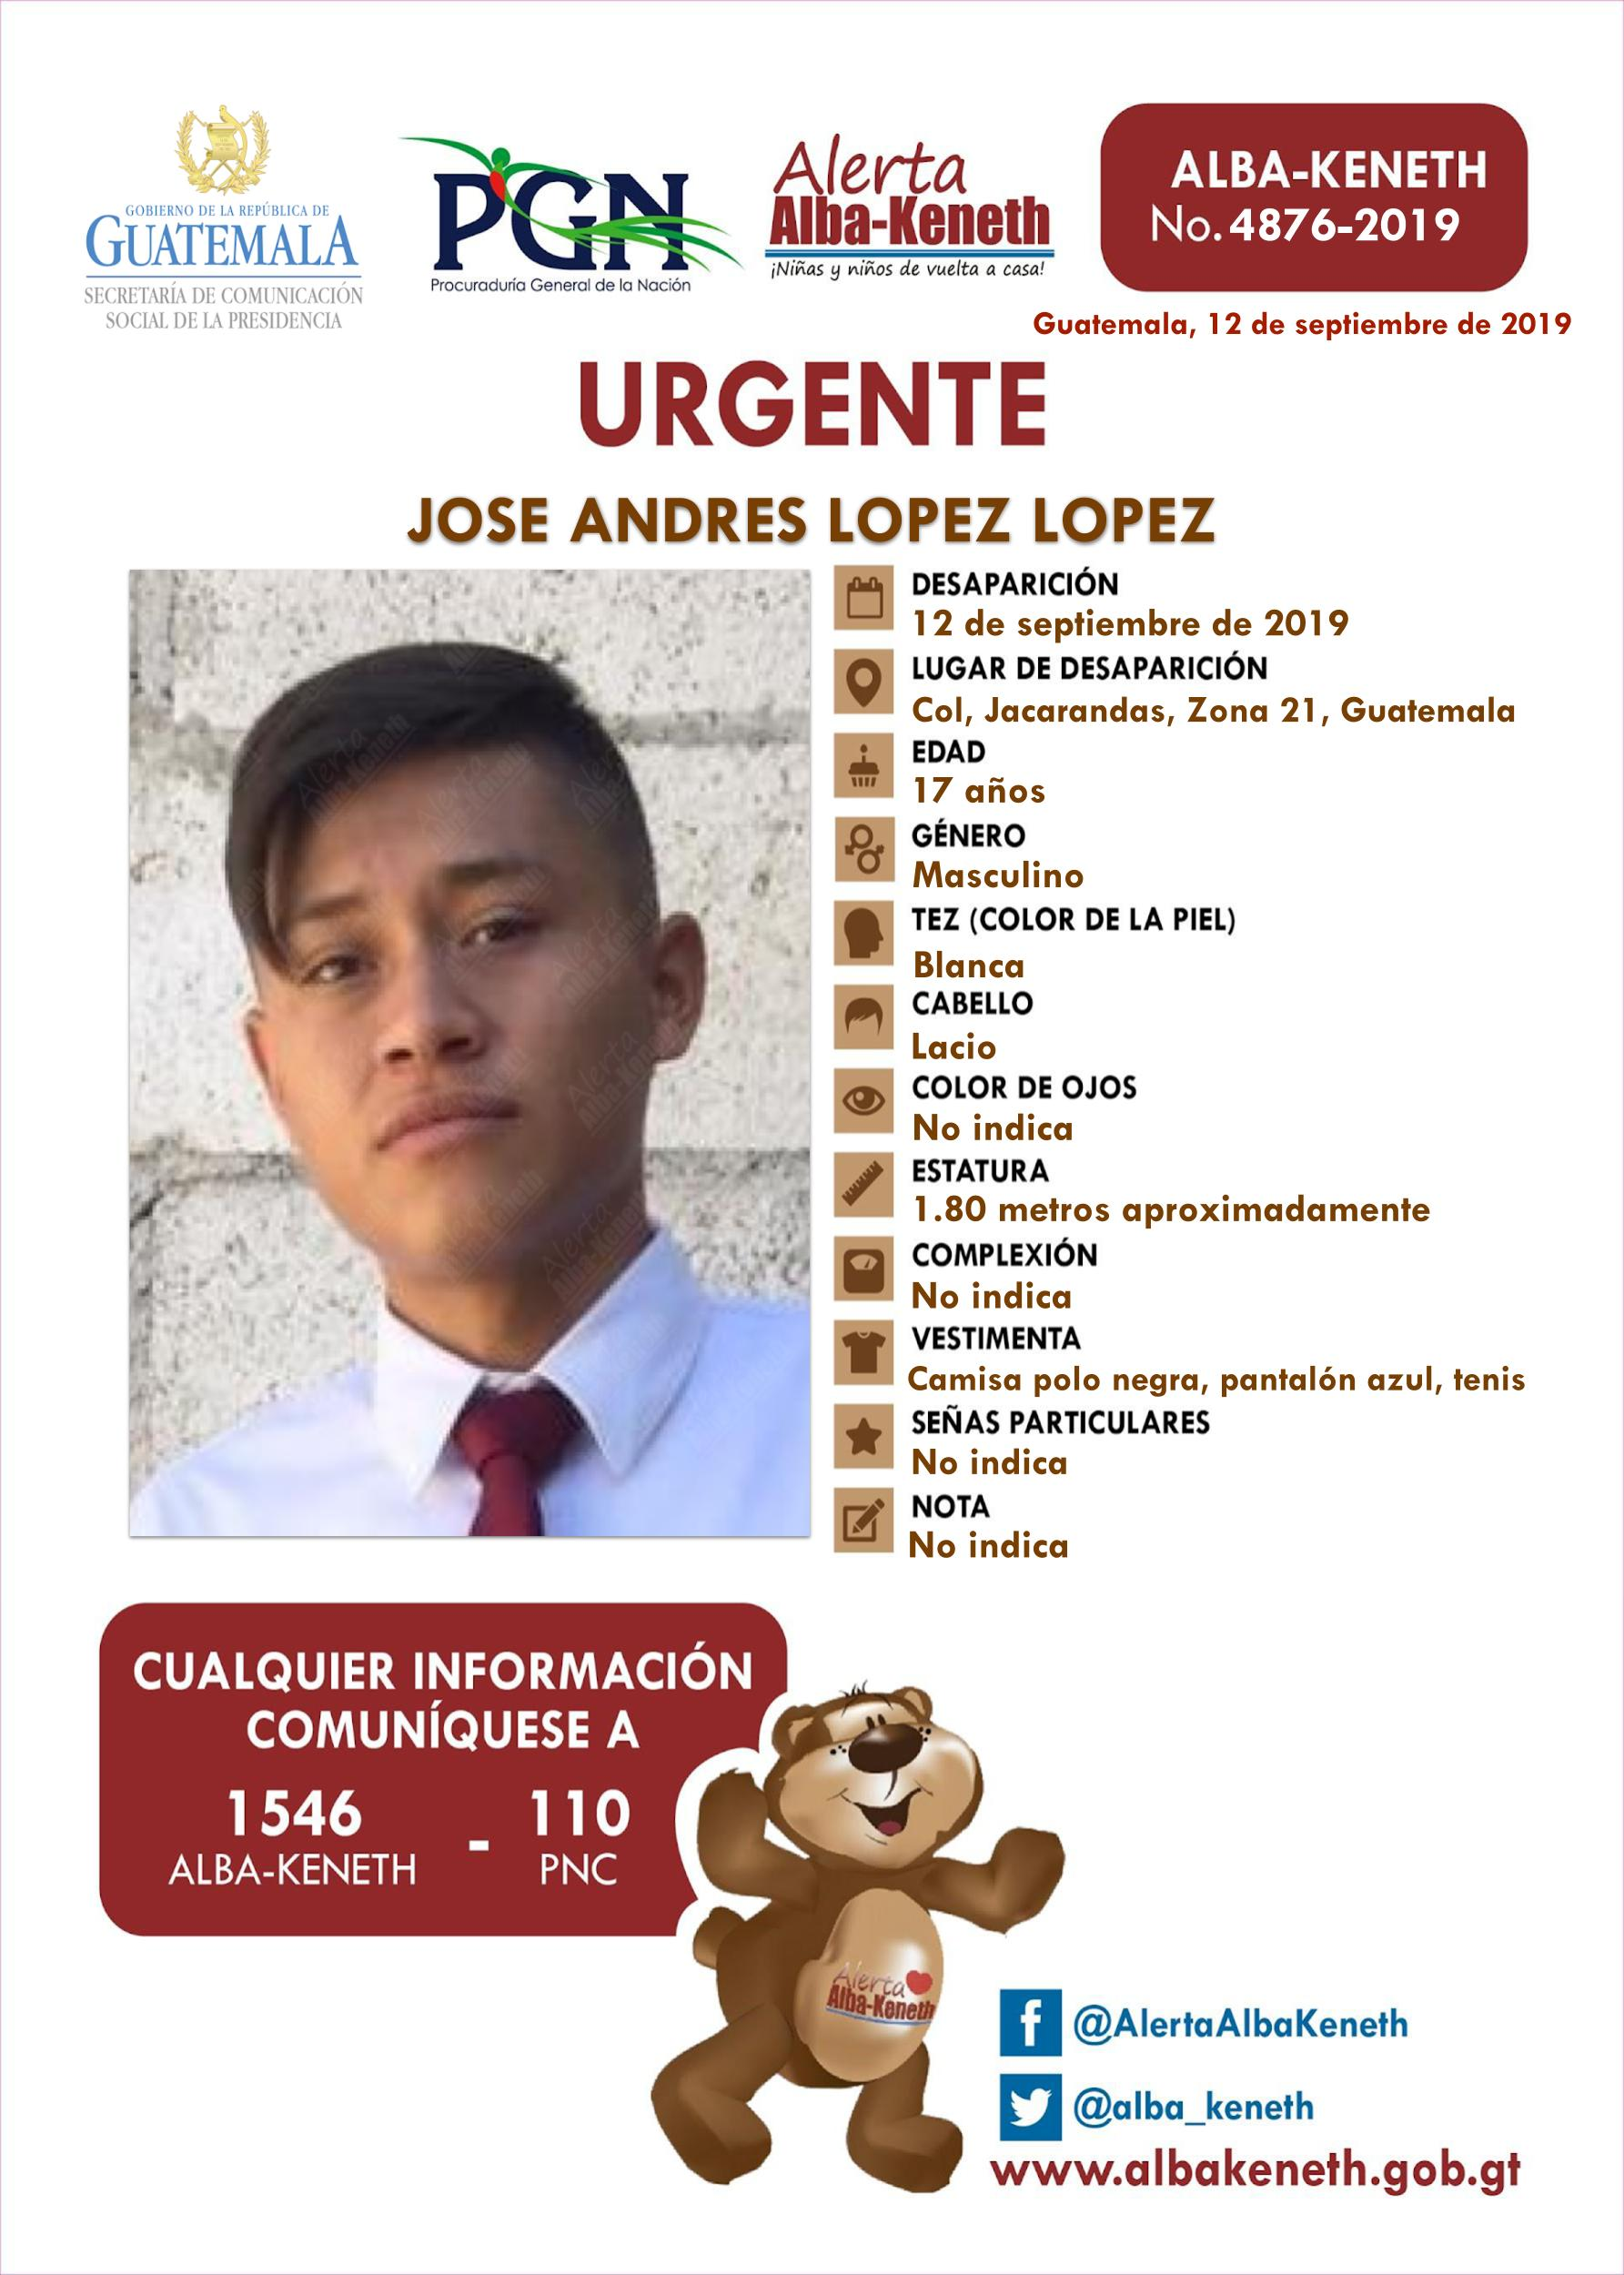 Jose Andres Lopez Lopez